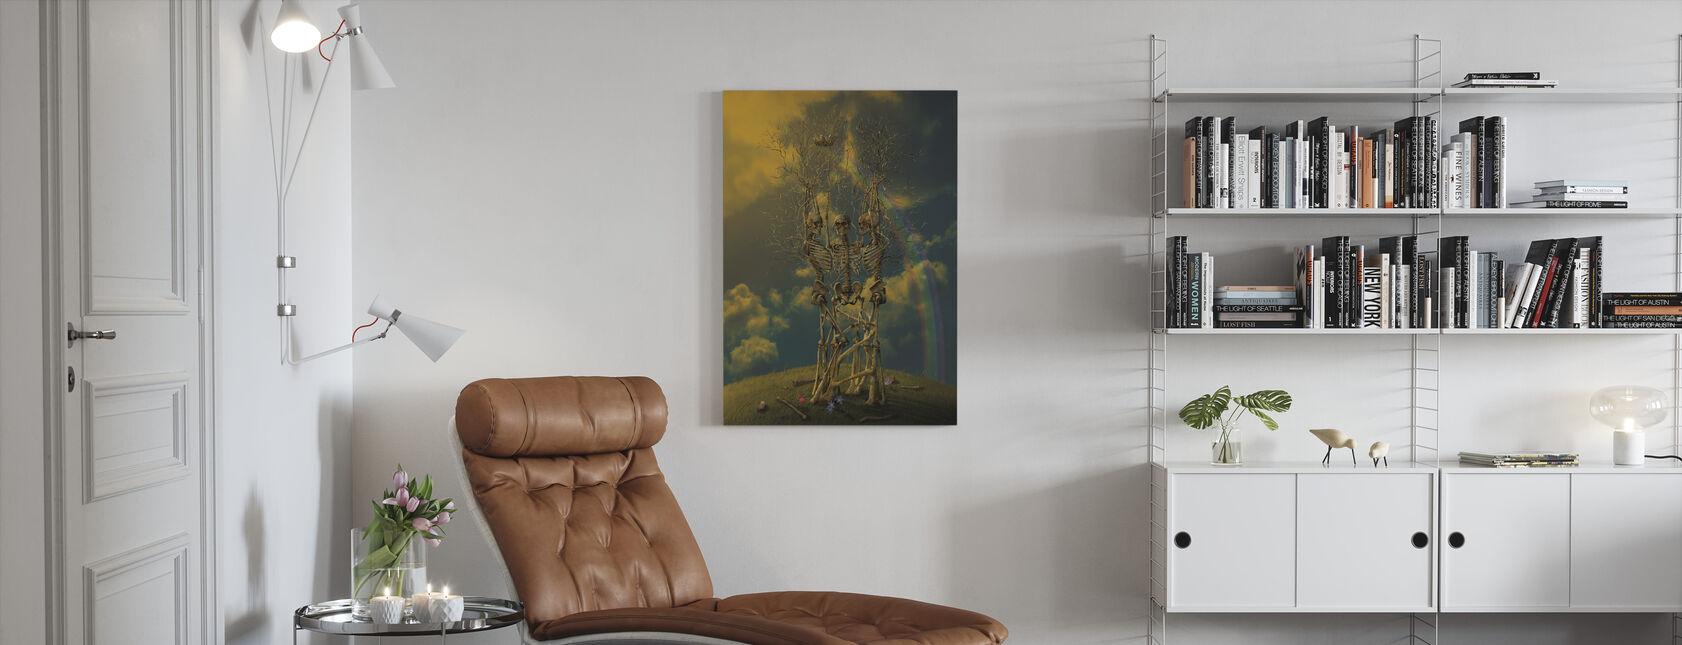 Levenscyclus - Canvas print - Woonkamer